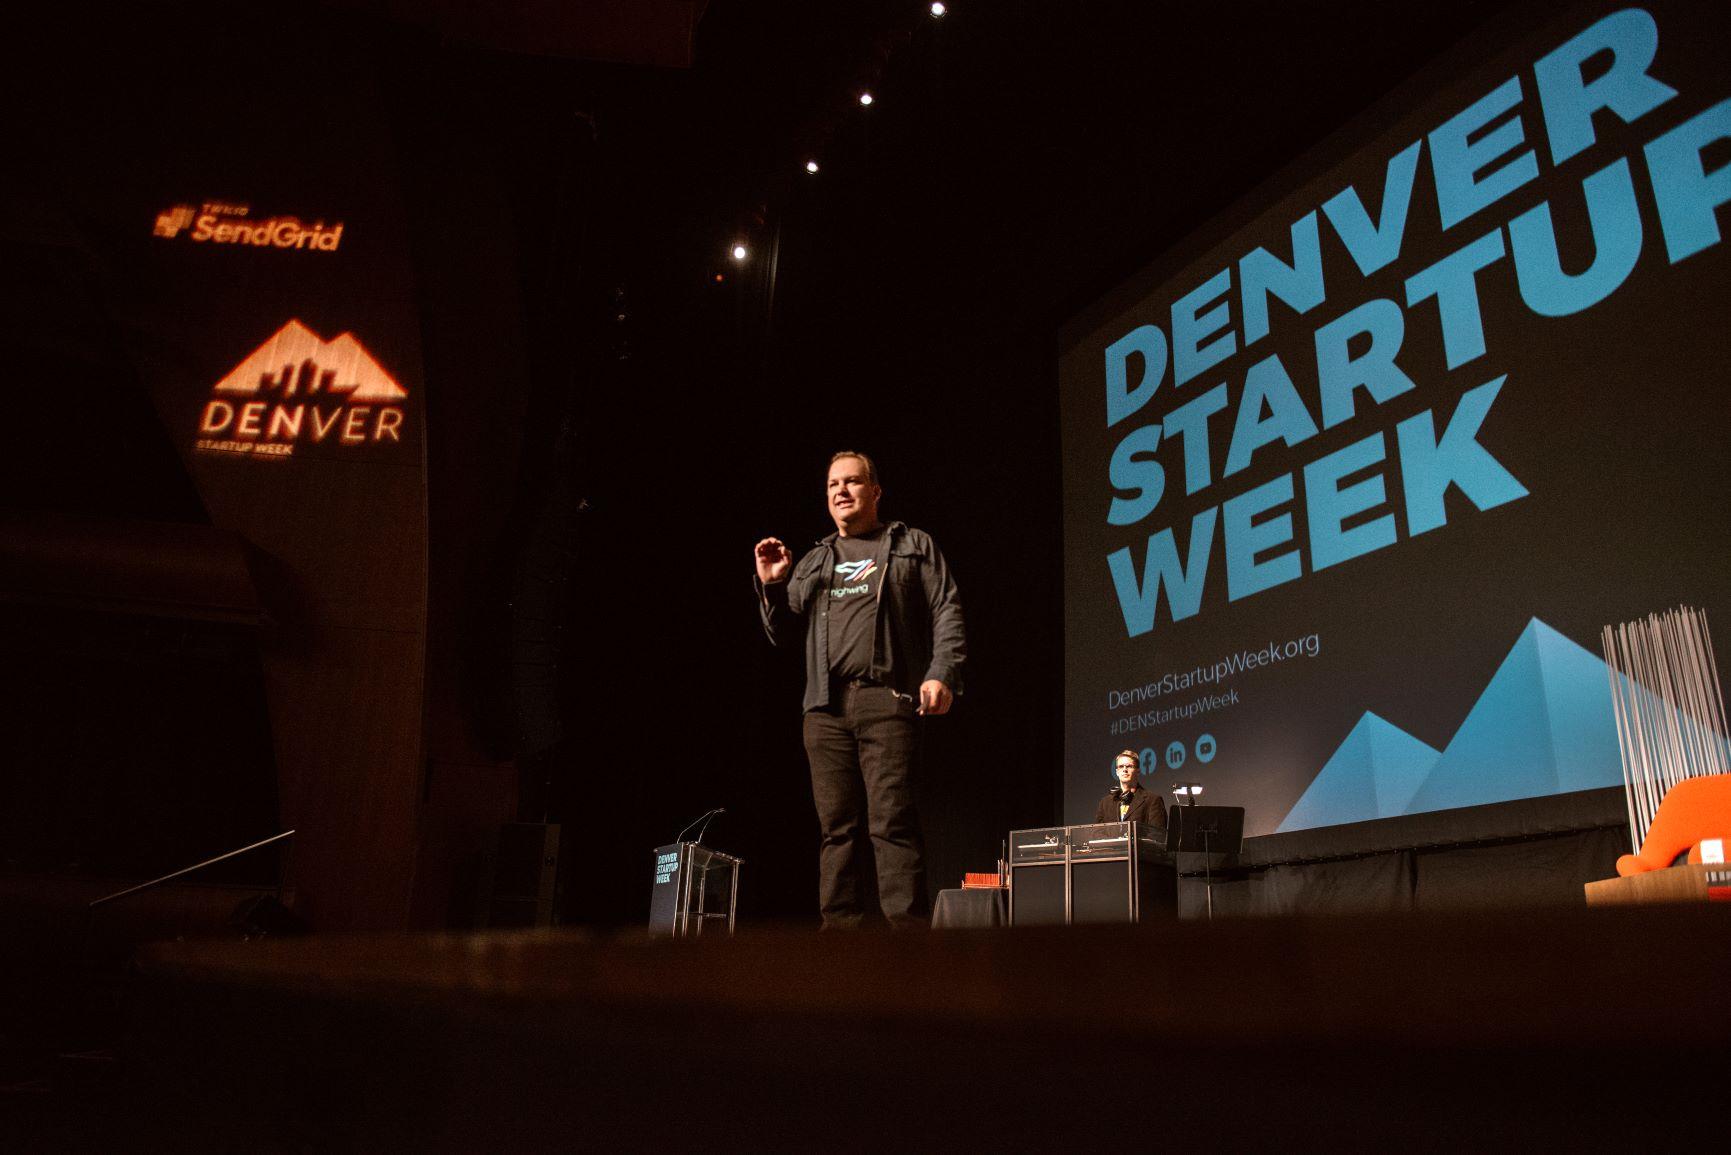 Top Highest-Rated Sessions In Denver Startup Week-fig 2